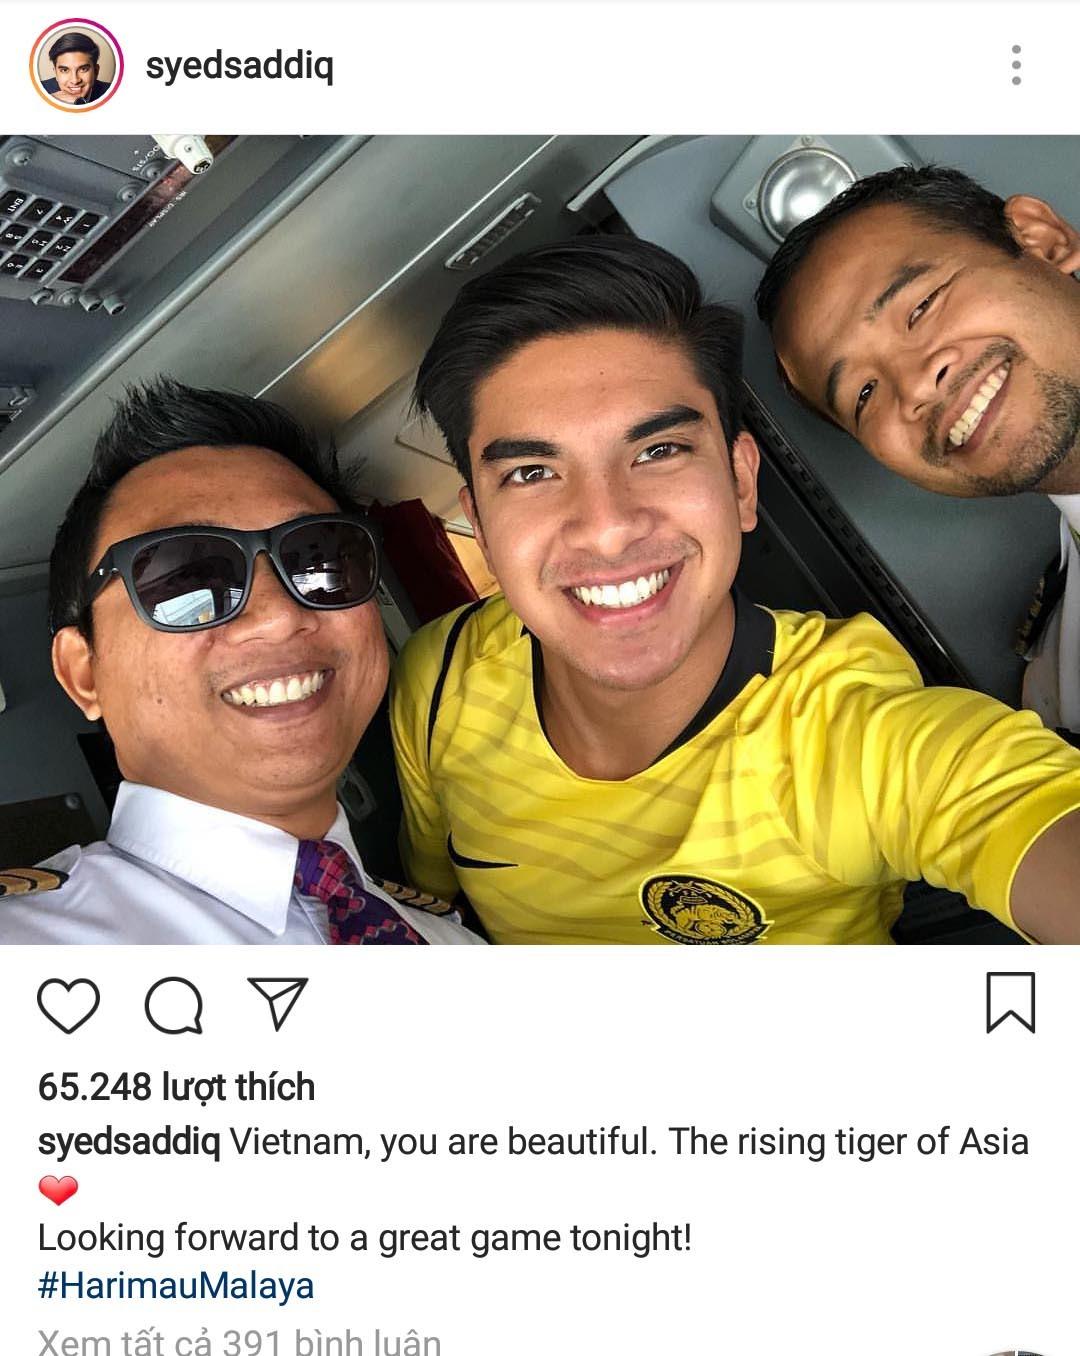 Đội tuyển Việt Nam,AFF Suzuki cup,Tuyển Malaysia,AFF Cup,chung kết AFF Cup